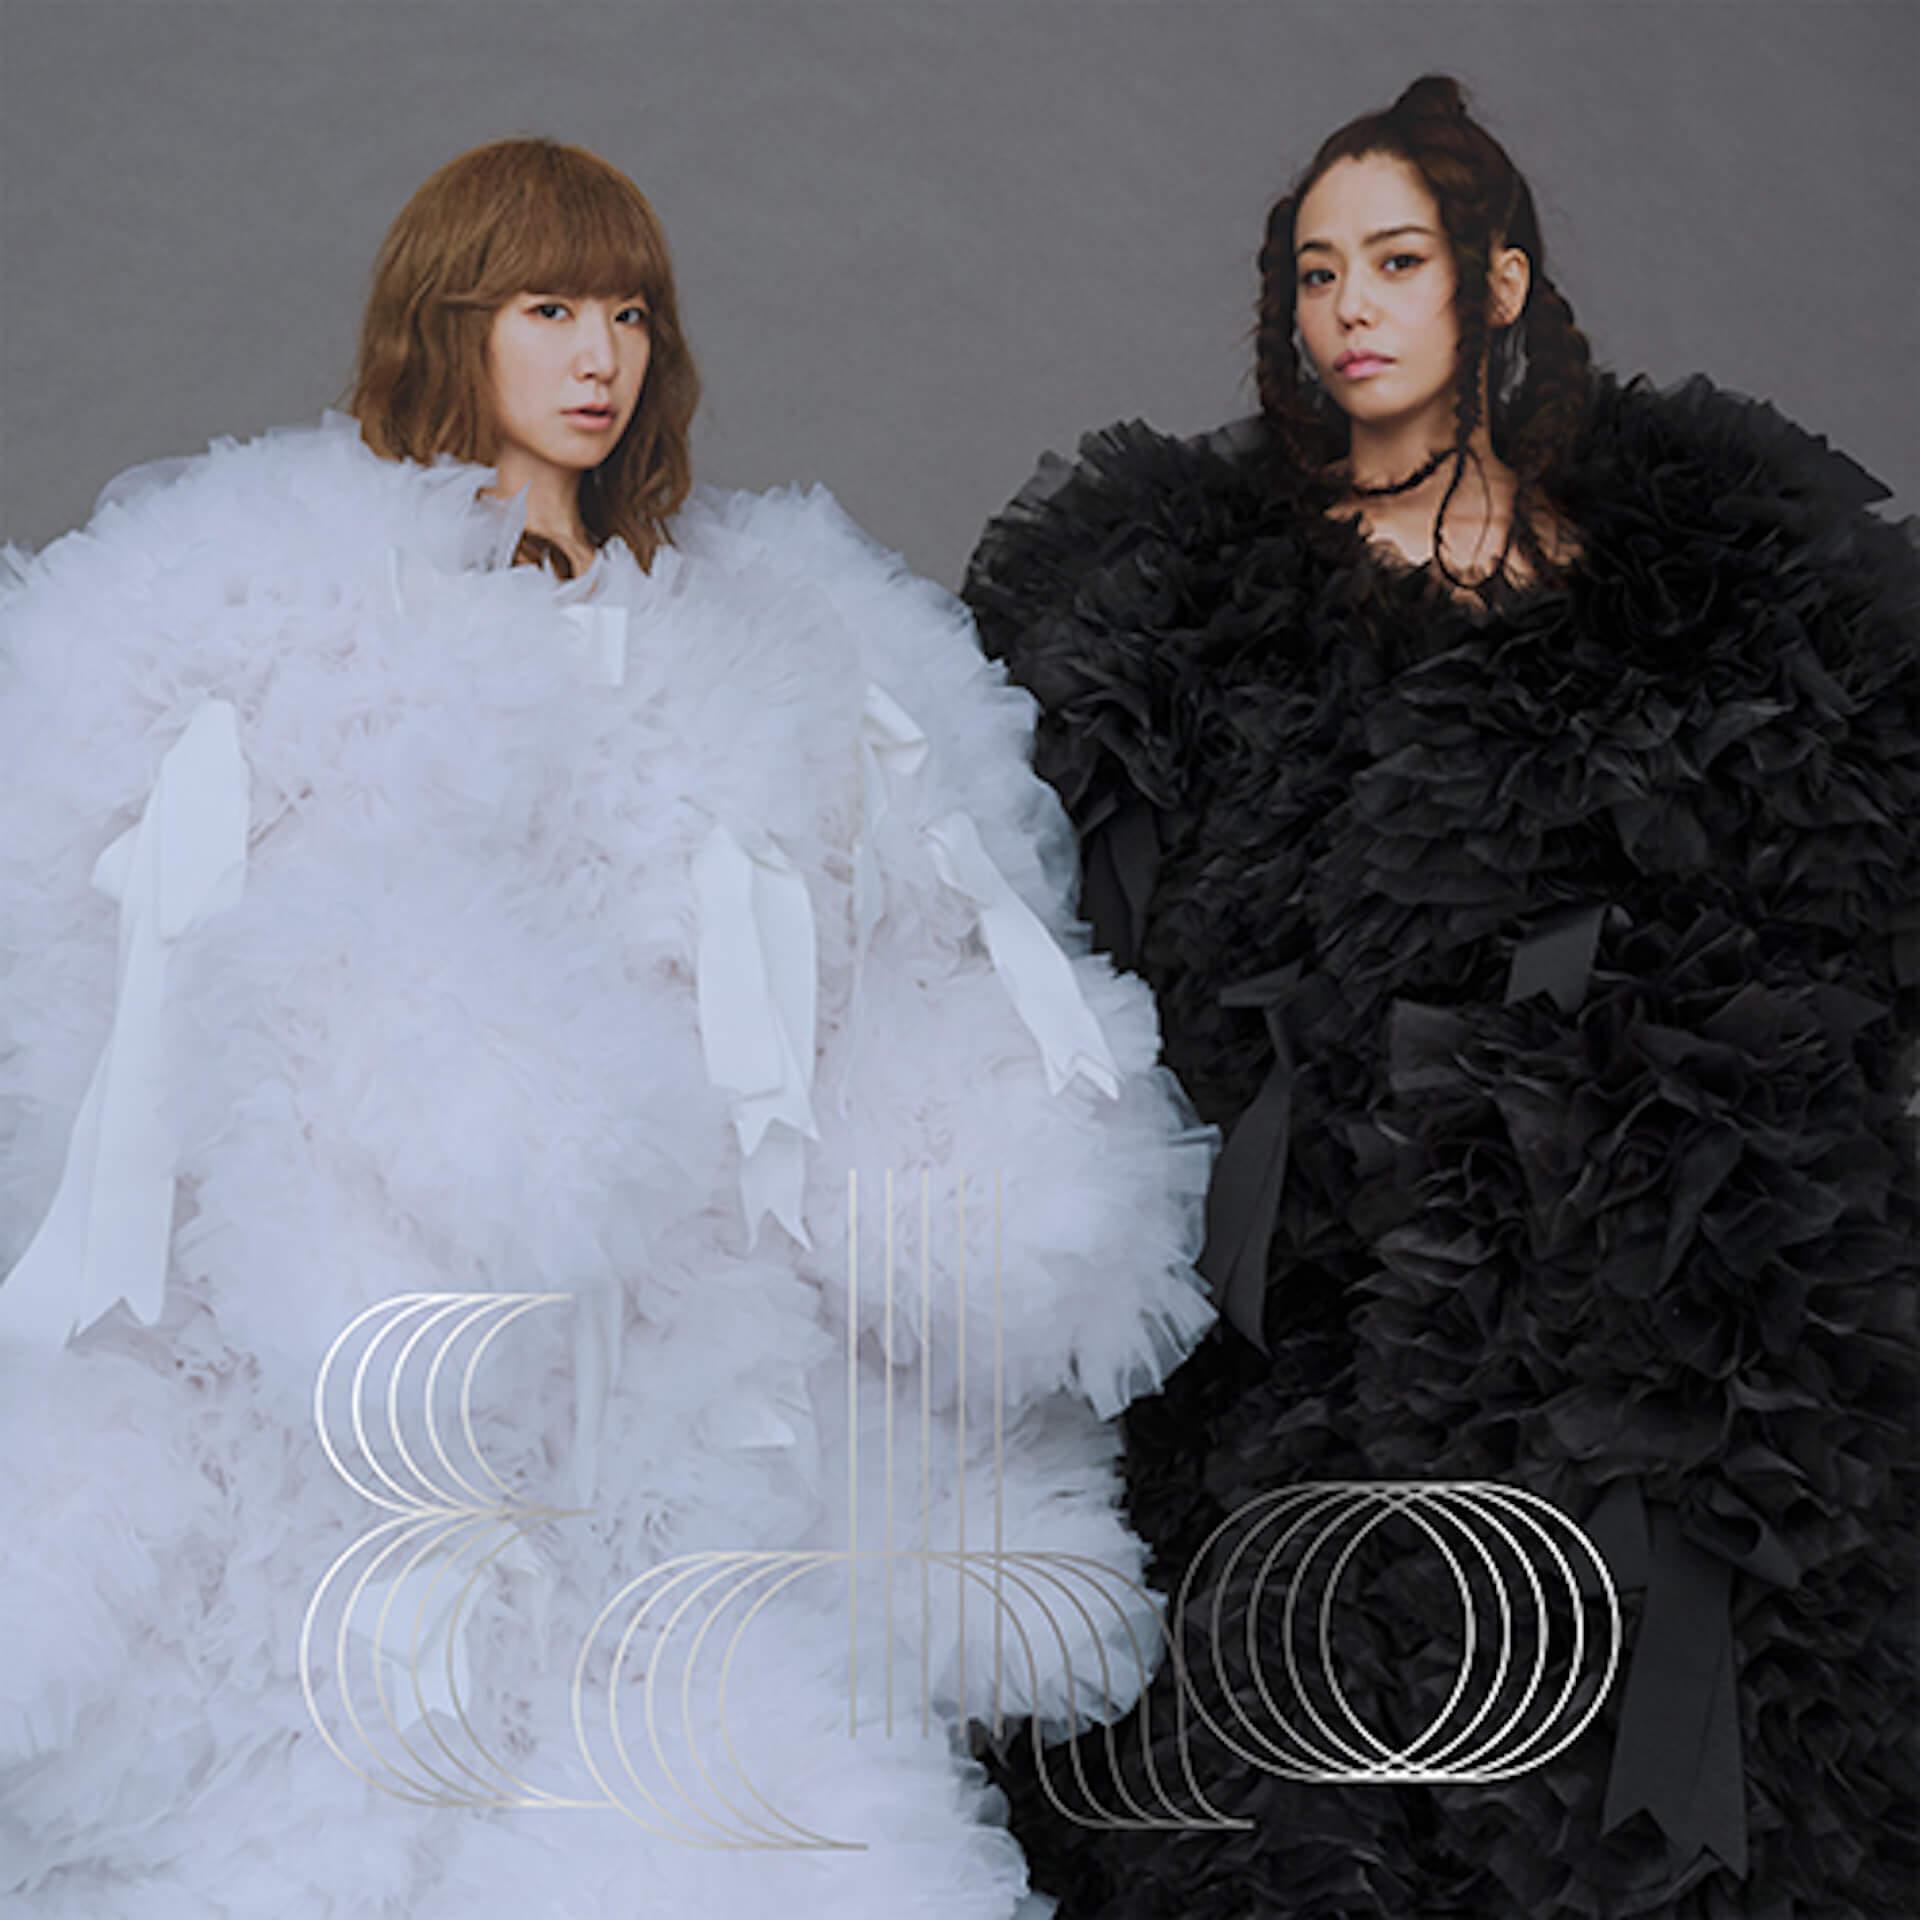 Chara+YUKI、本日リリースのシングル「楽しい蹴伸び」のMVを公開 MV共演は21年ぶり music200131_charayuki_4